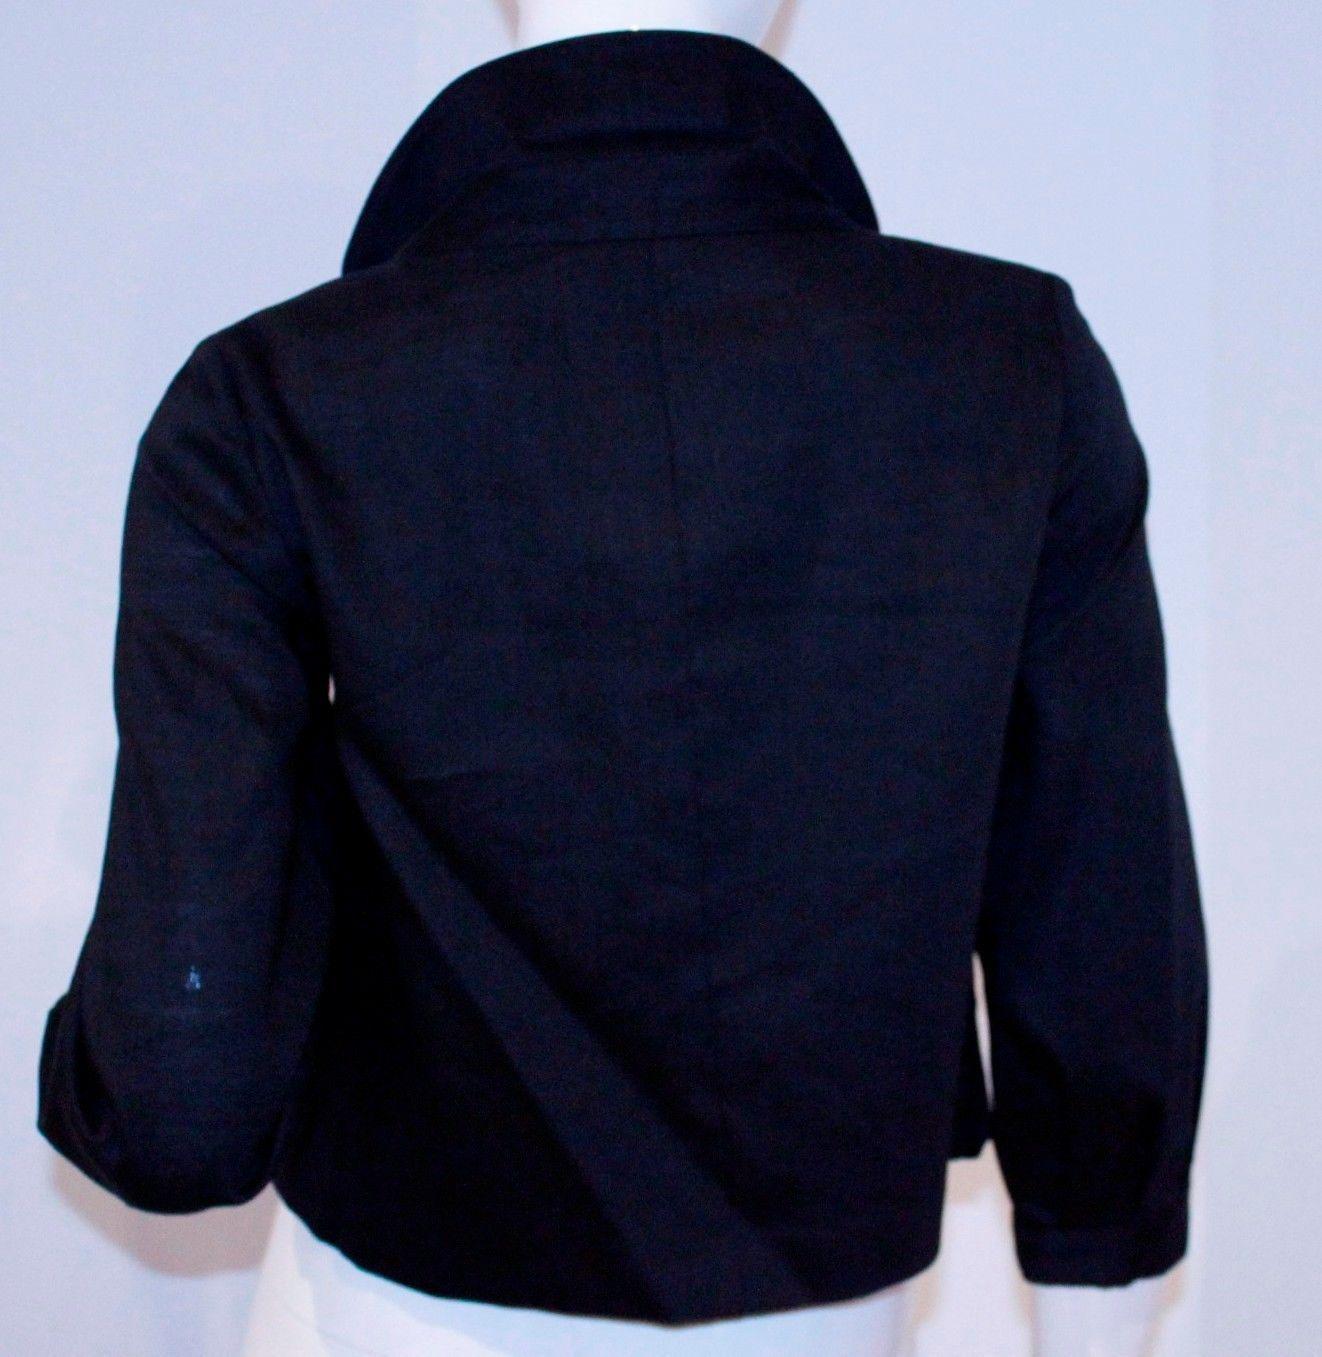 7a64771f03 THEORY Mini JACKET Button Suit BLAZER Mod KOSIA 0 $435 FREE SHIPPING